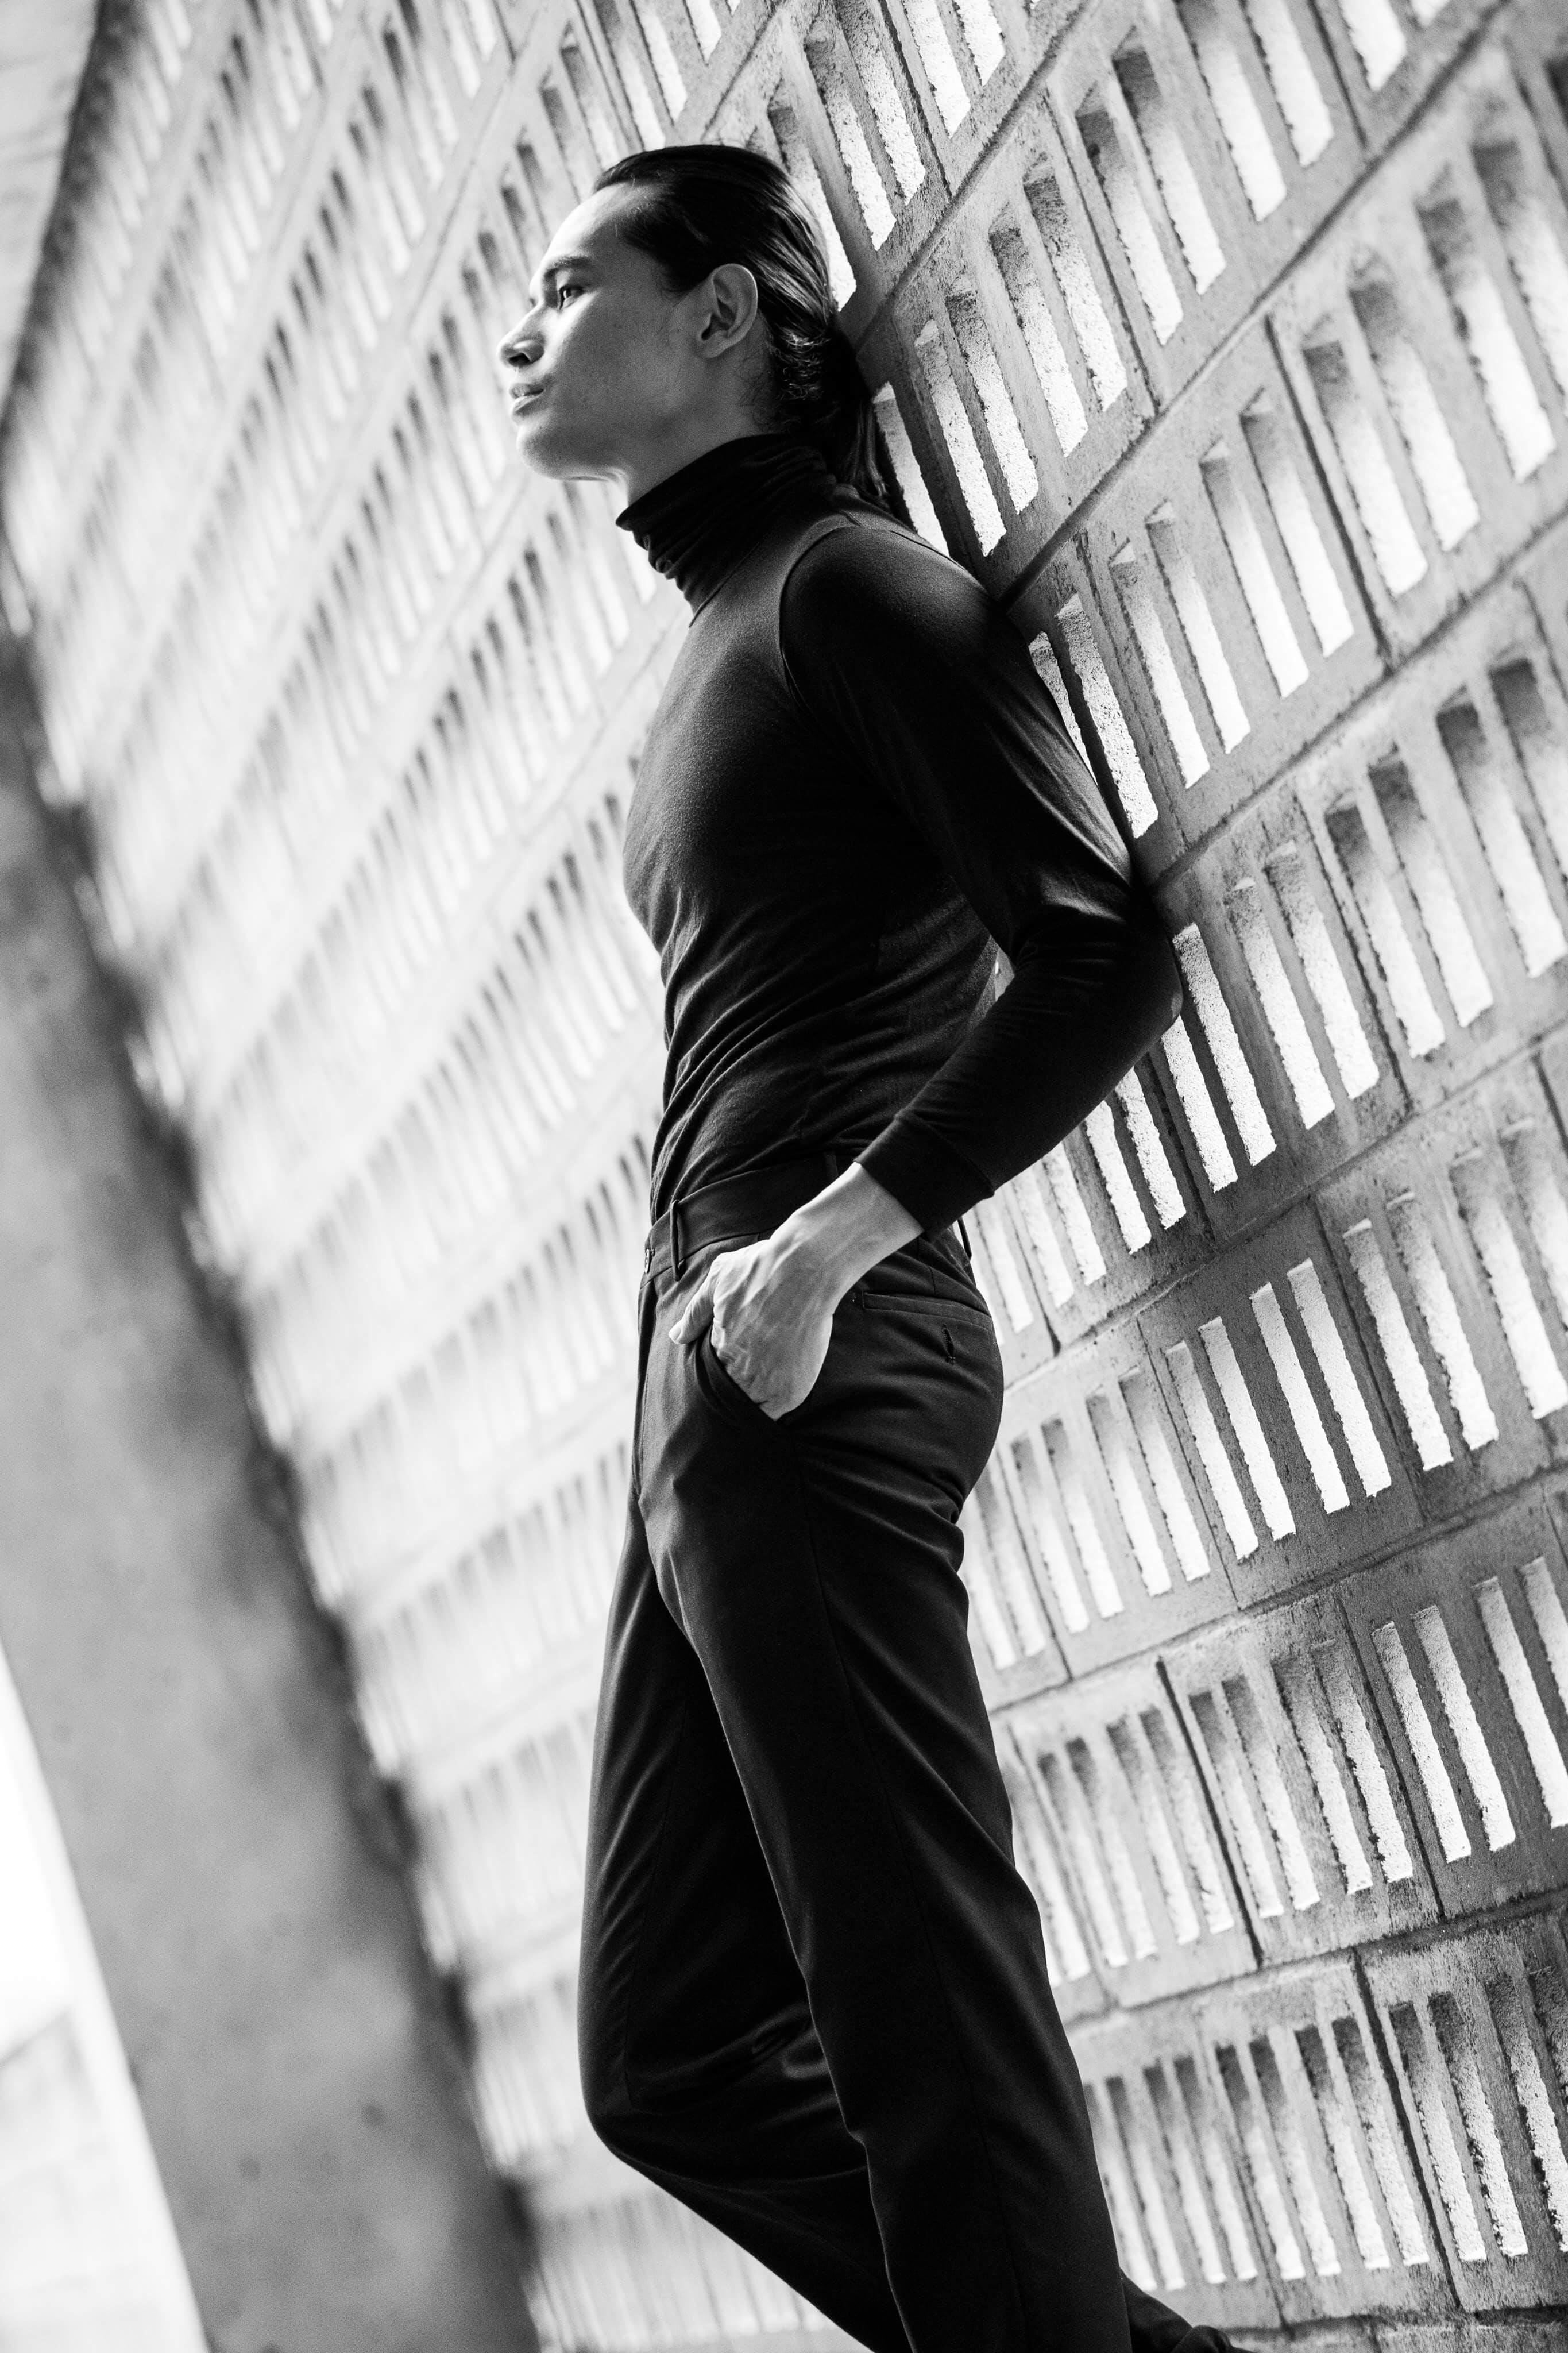 Monochrome Photo of Man Wearing Black Long Sleeves